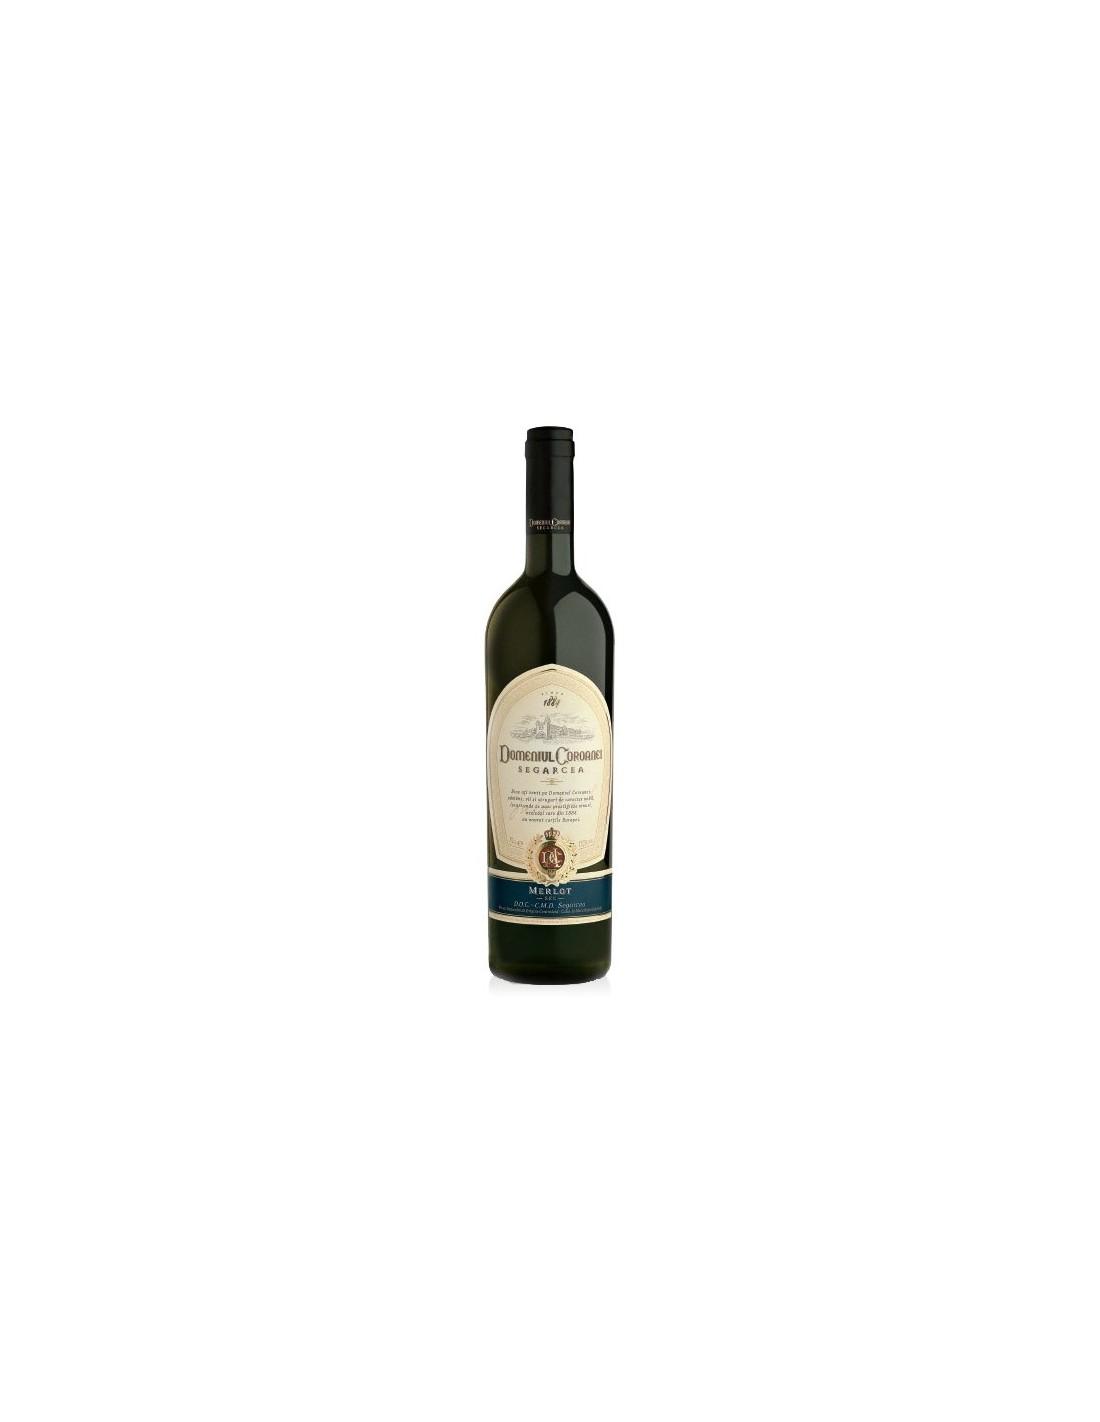 Vin rosu sec, Merlot, Domeniul Coroanei Segarcea, 0.75L, 14.5% alc., Romania